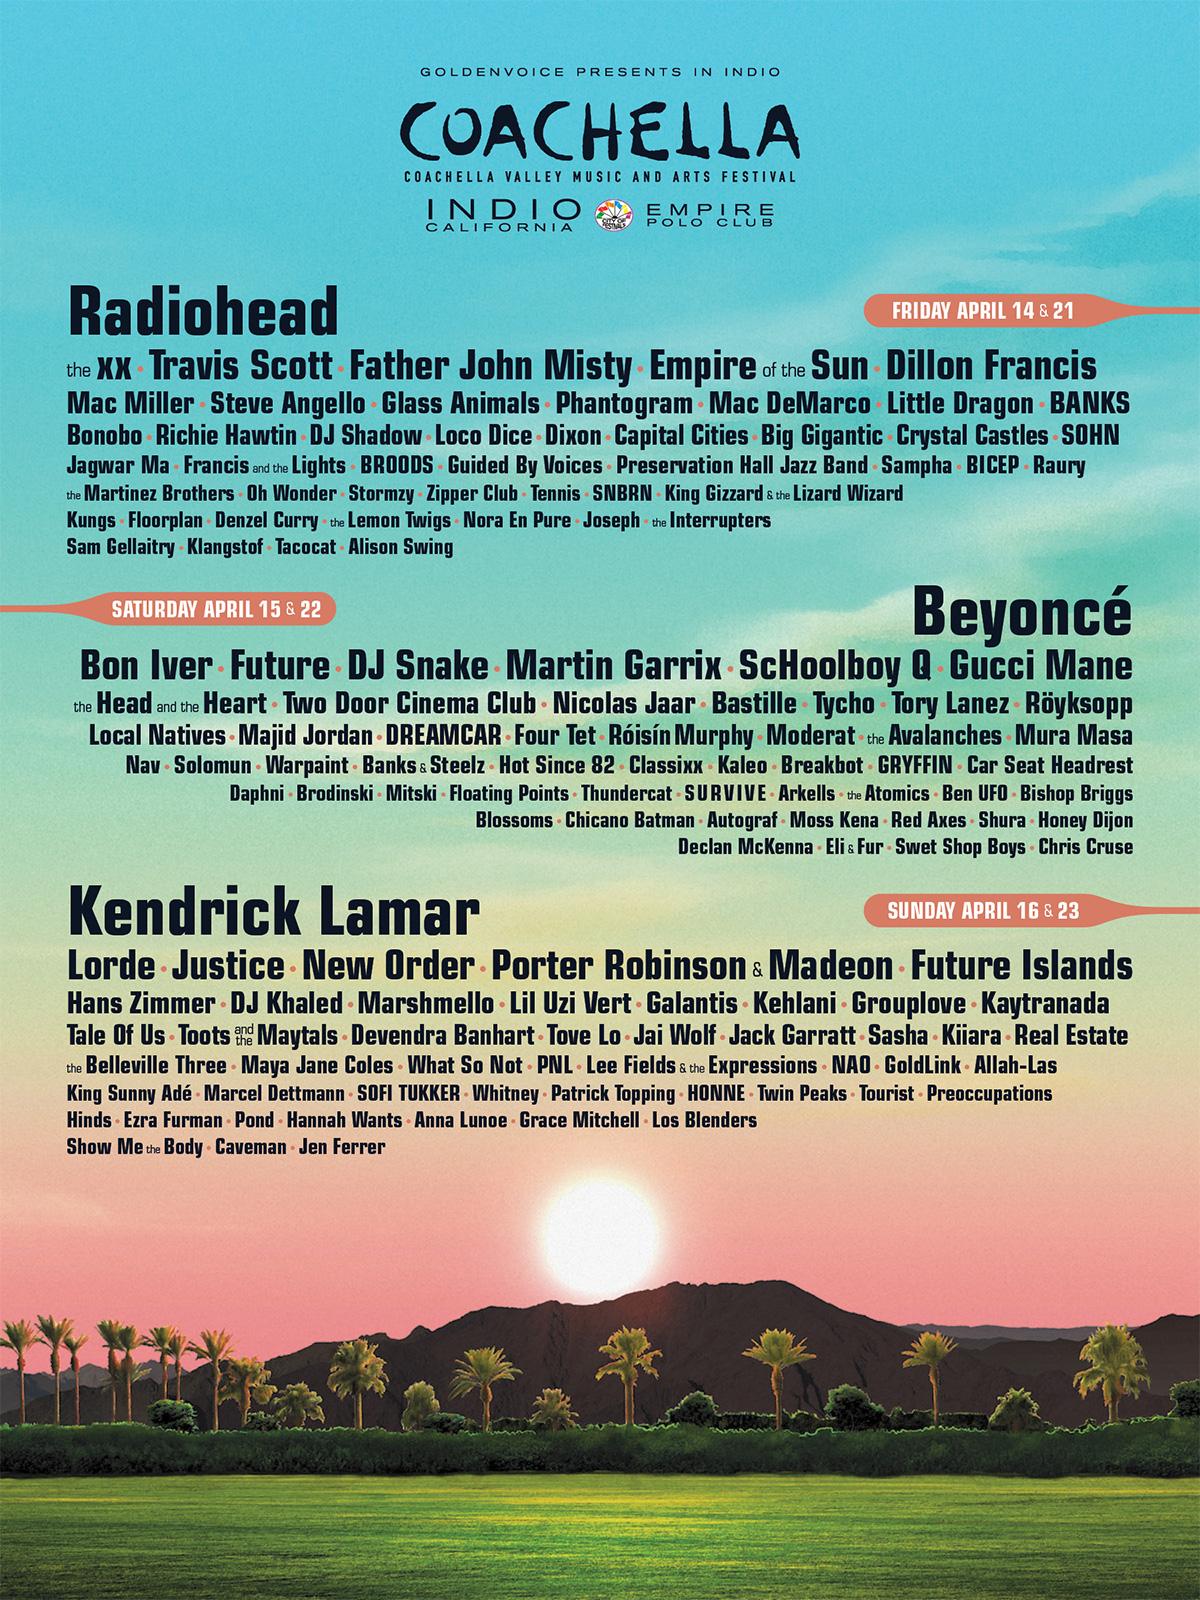 Coachella lineup 2017 flyer